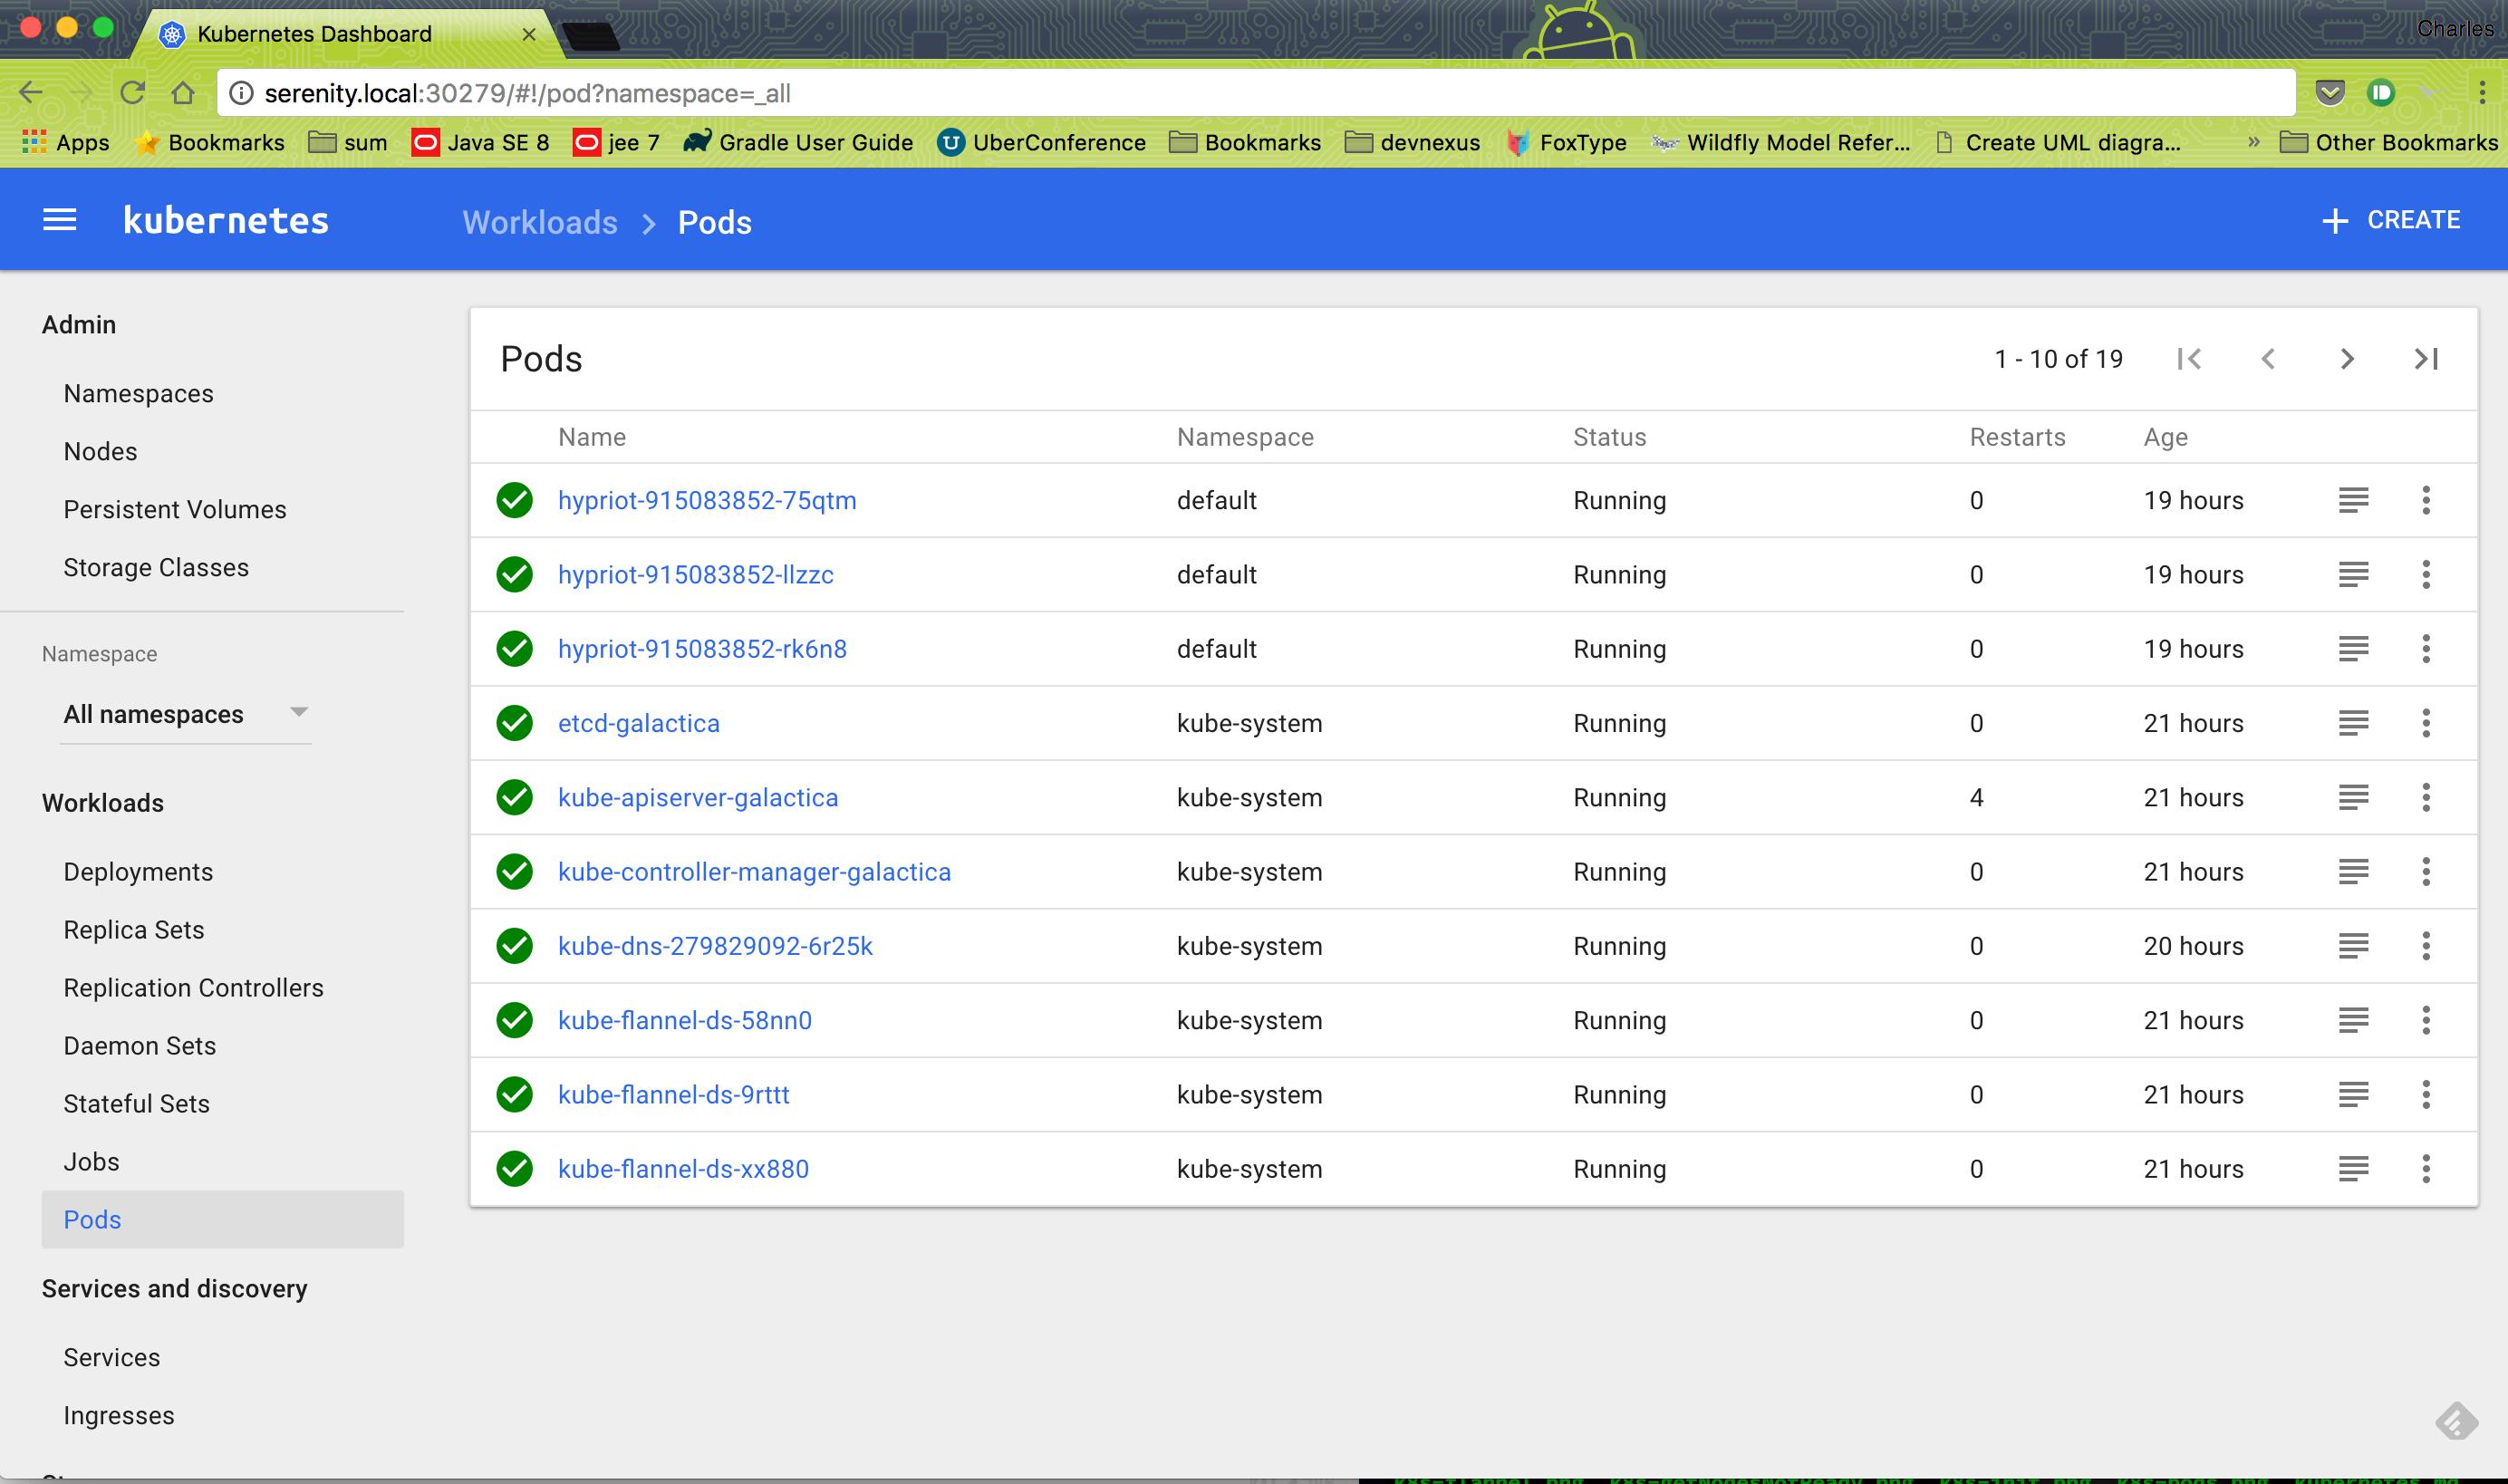 k8s-dashboard-browser